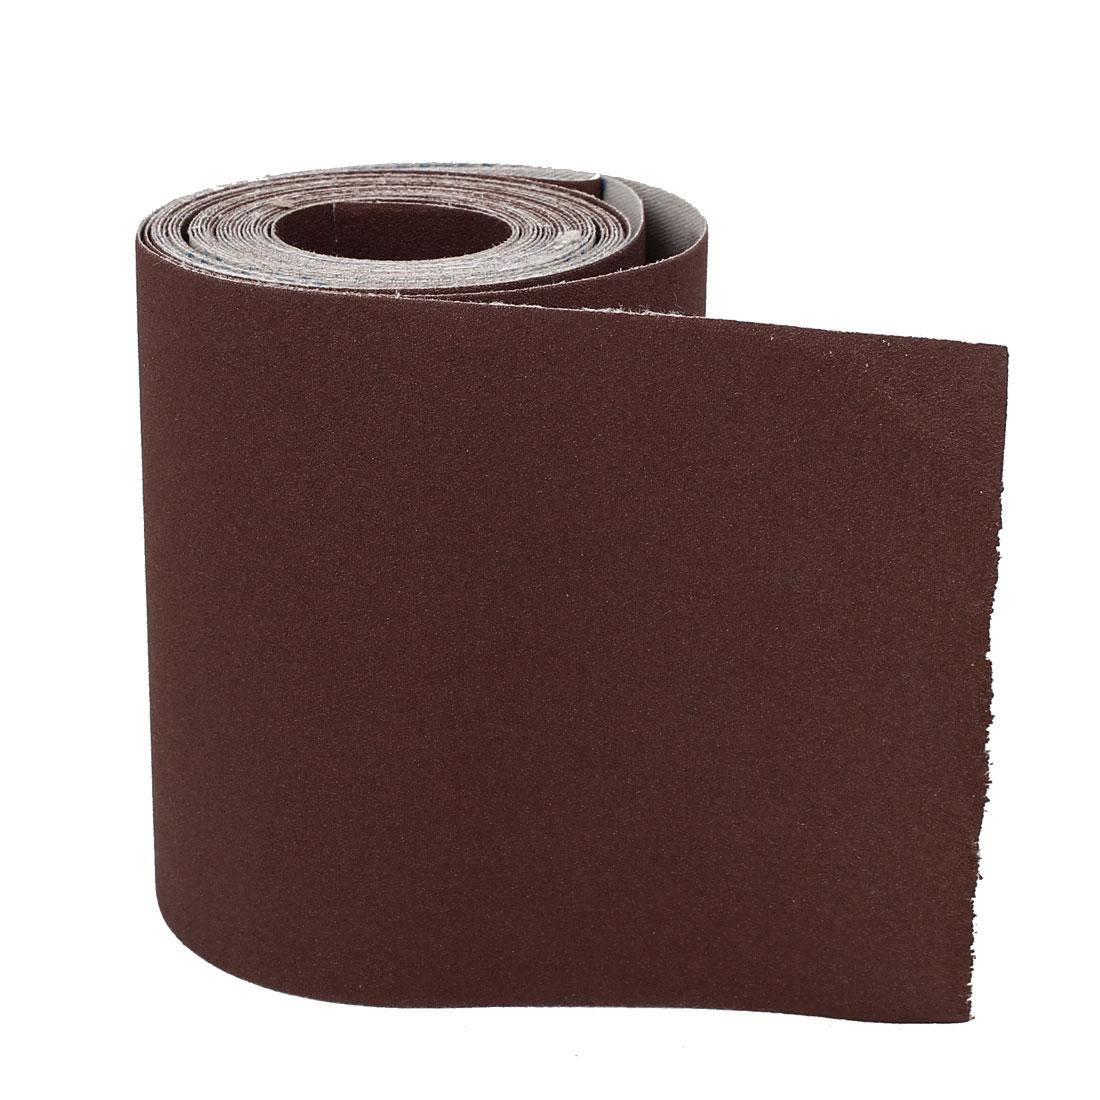 5M Long 115mm Width 240 Grit Abrasive Sanding Sand Paper Sandpaper